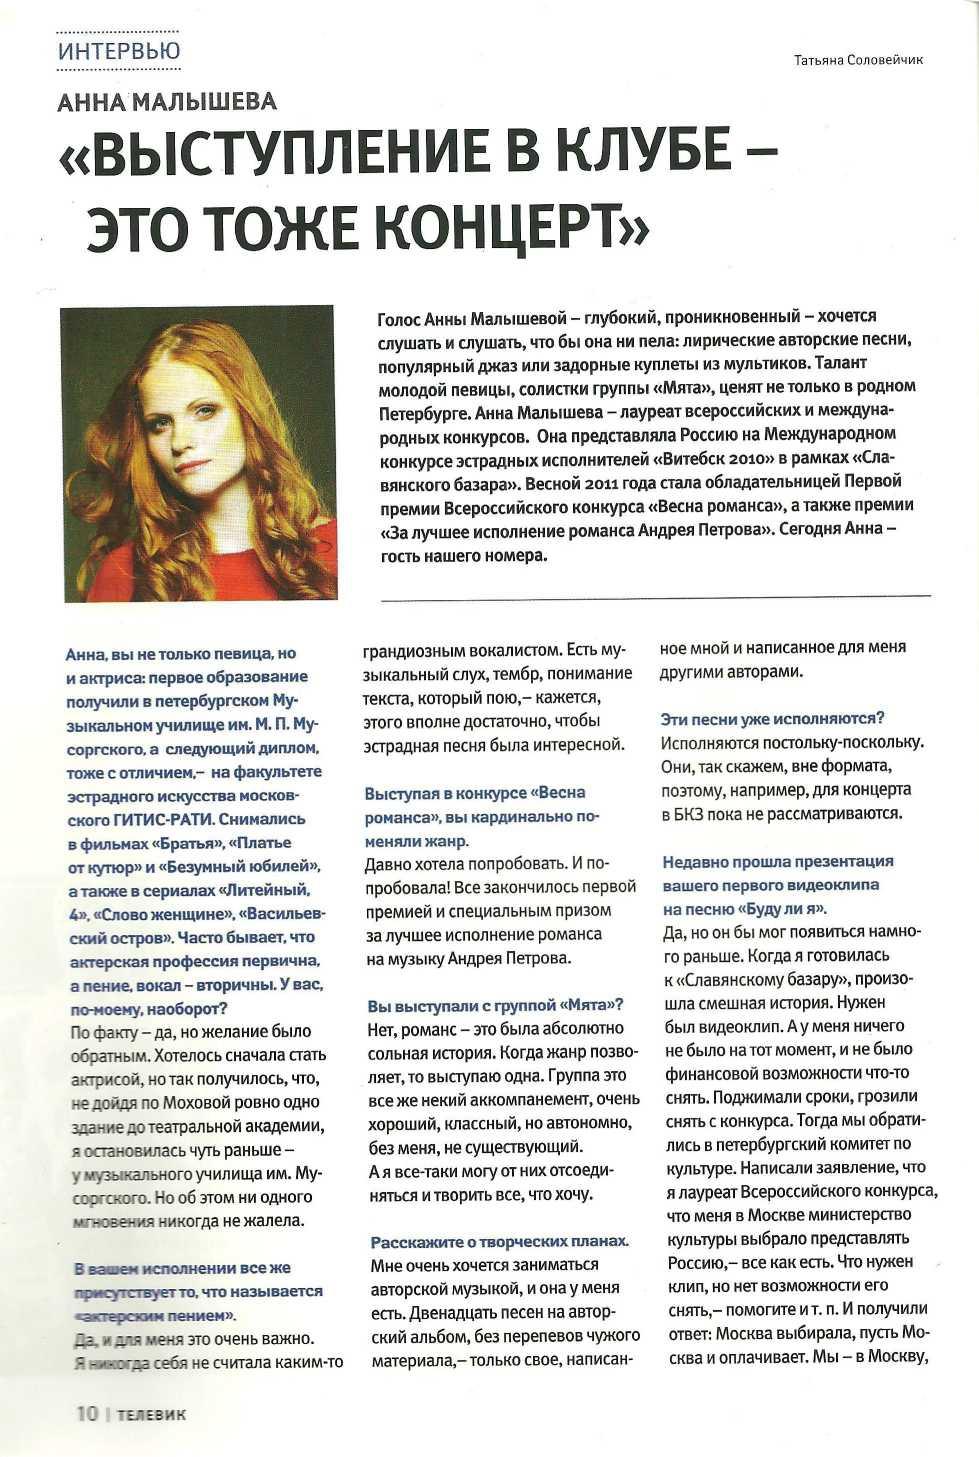 Press_Televik_1203_1